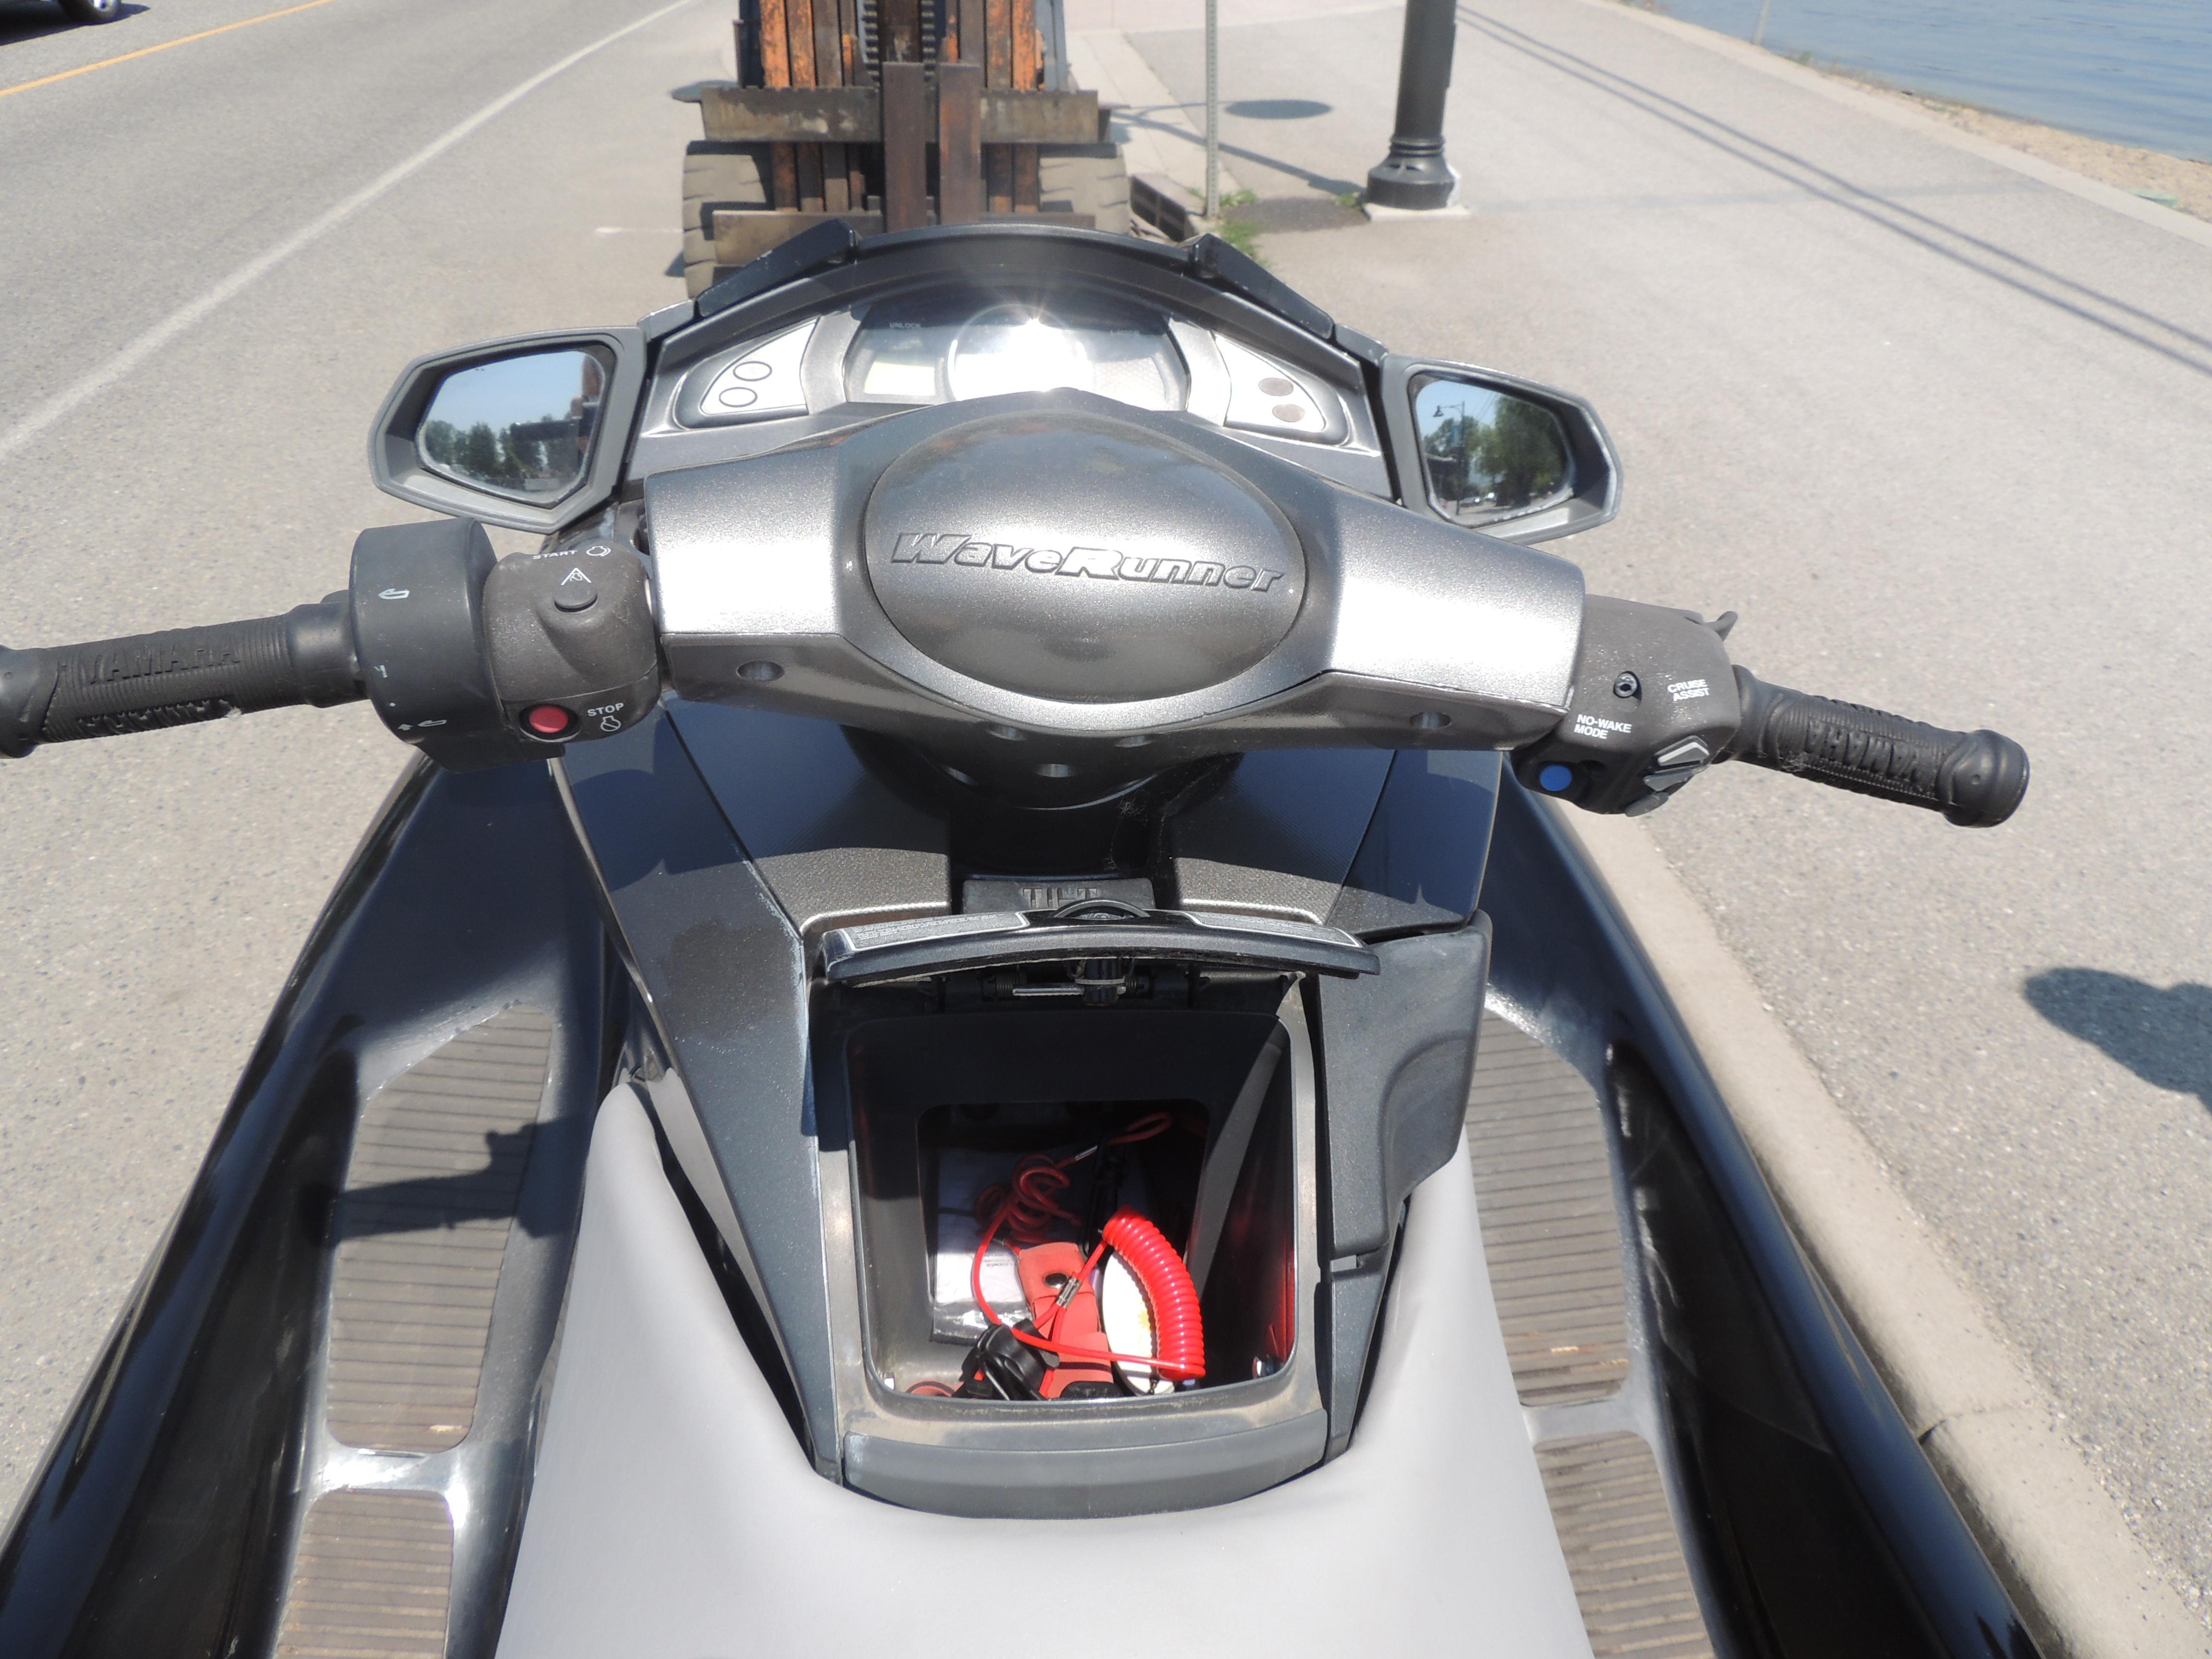 2008 Yamaha Waverunner FX 1800